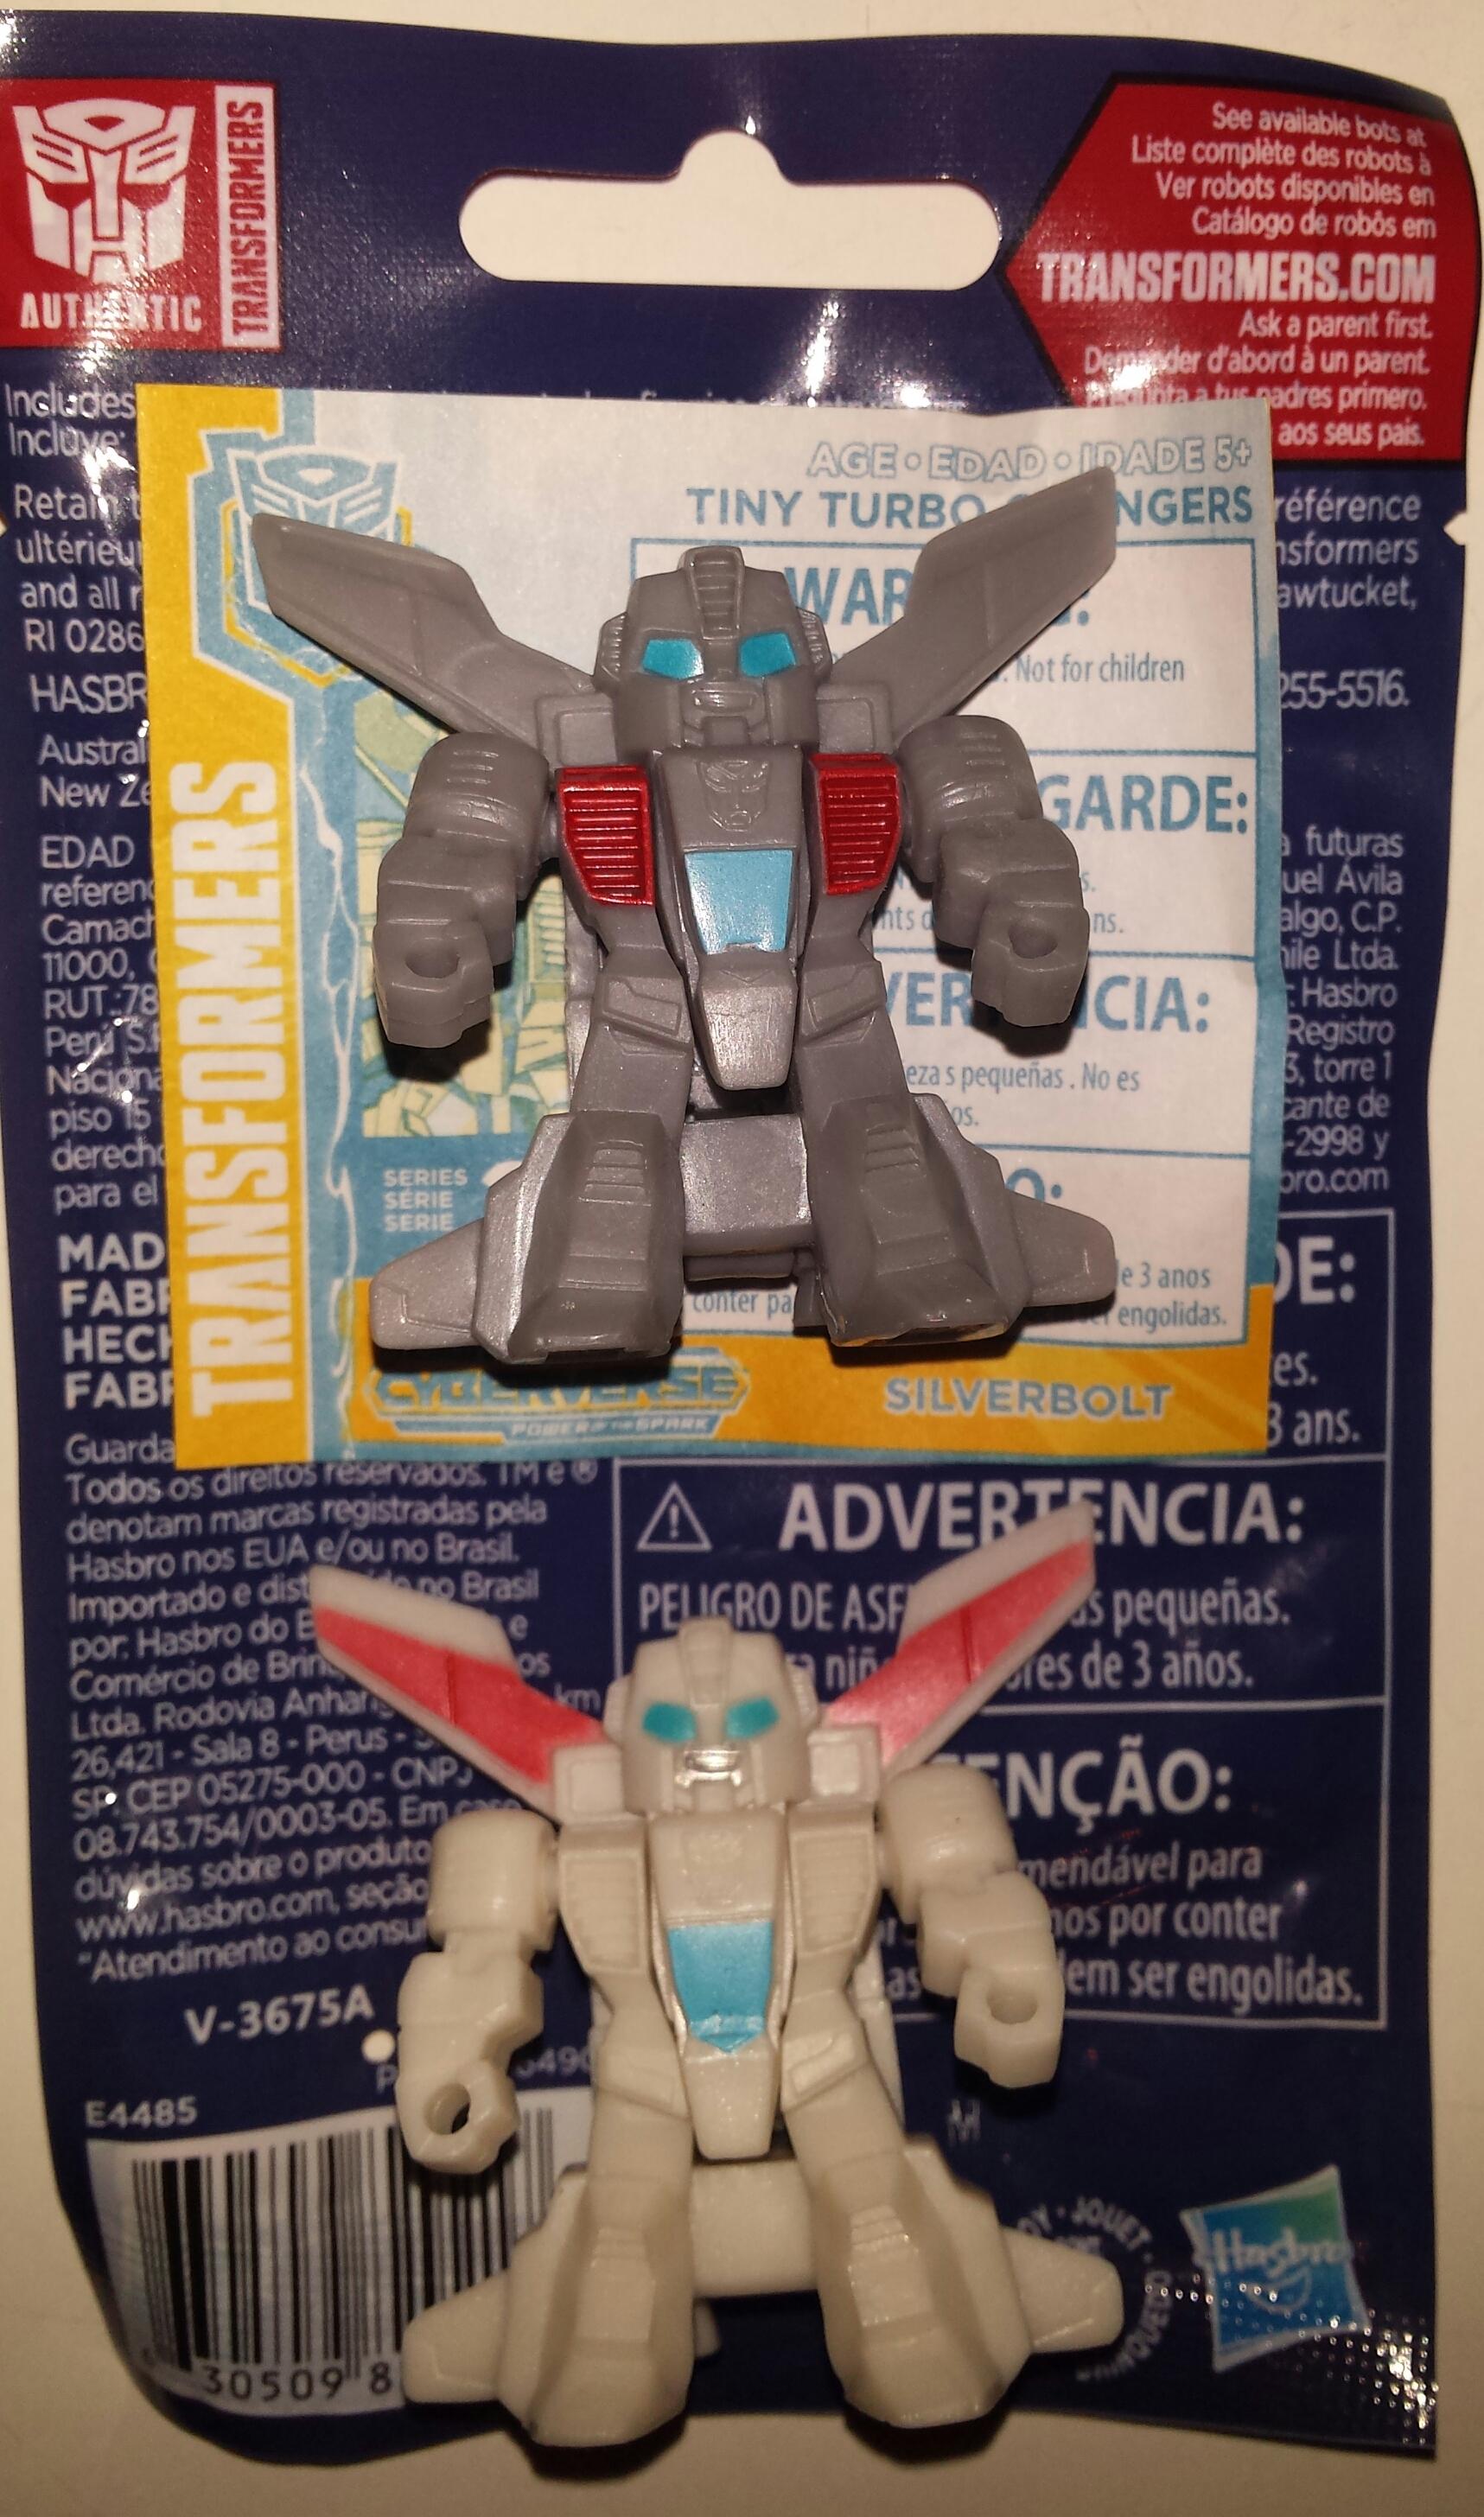 Silverbolt Transformers cyberverse TINY TURBO changeurs série 2 2019 Hasbro NOUVEAU